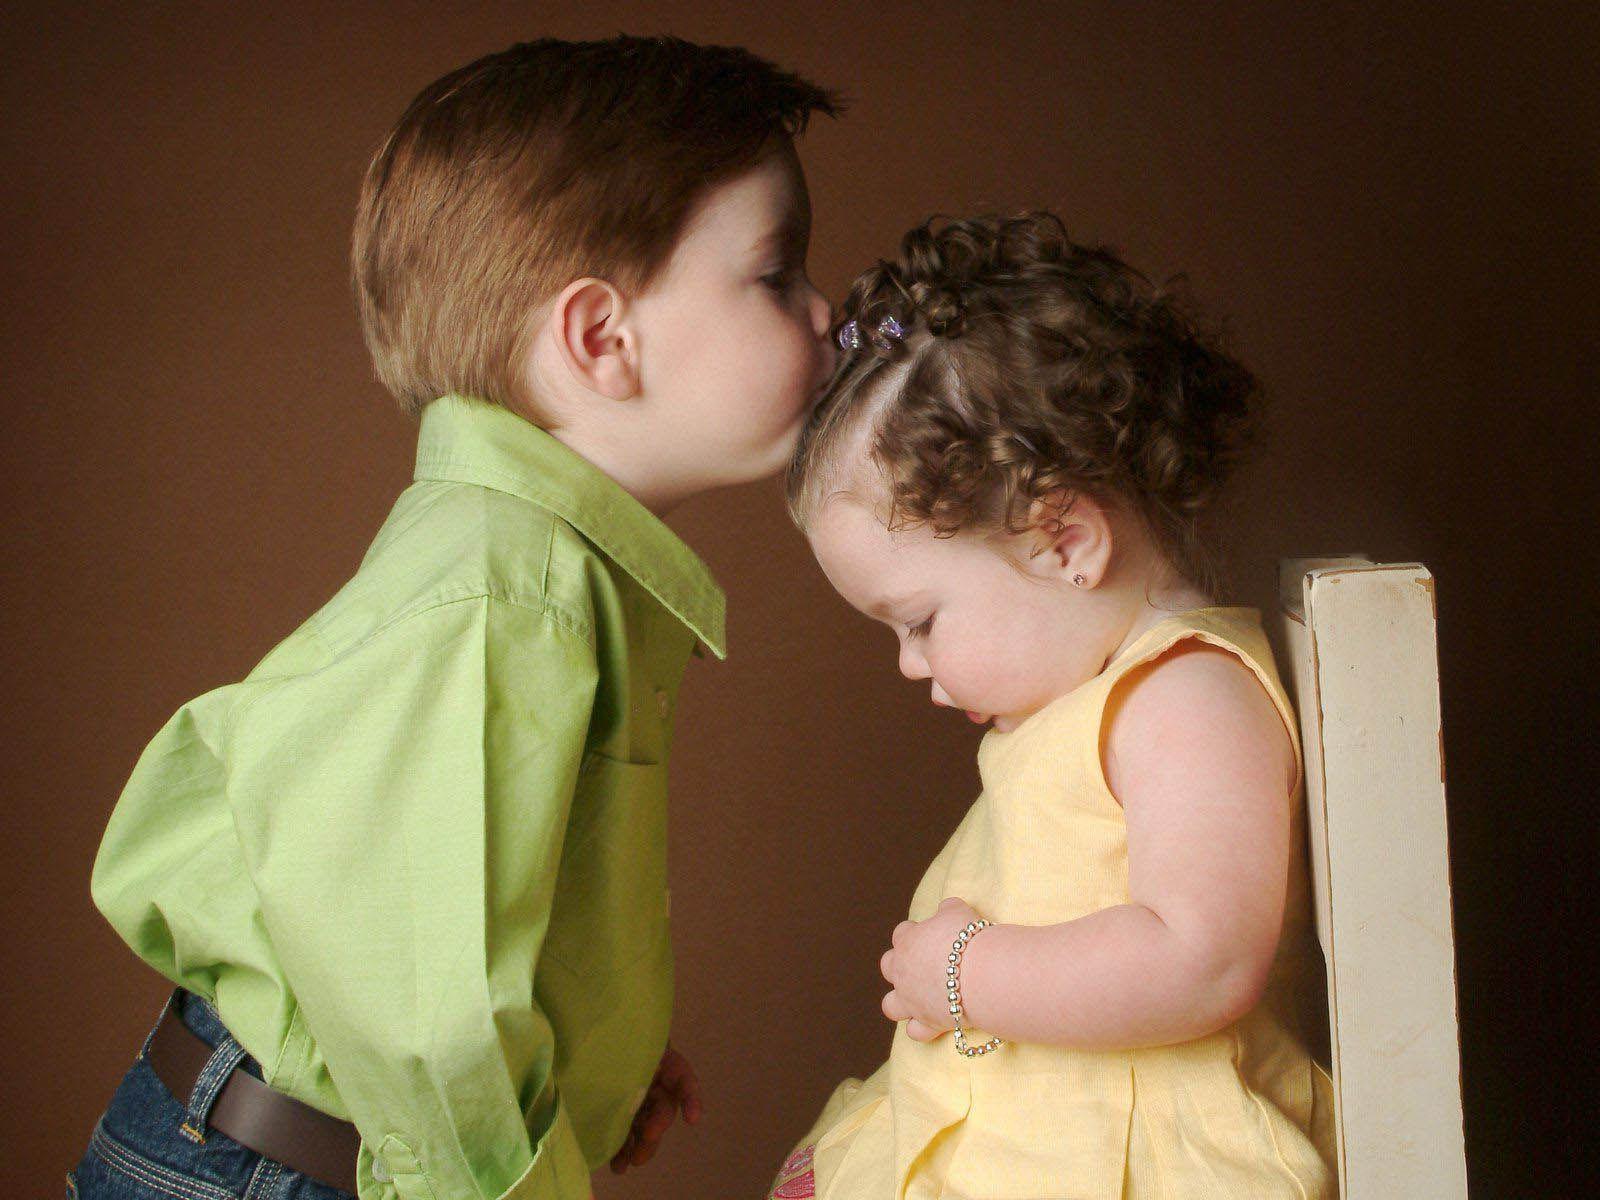 Kissing Wallpaper Hd